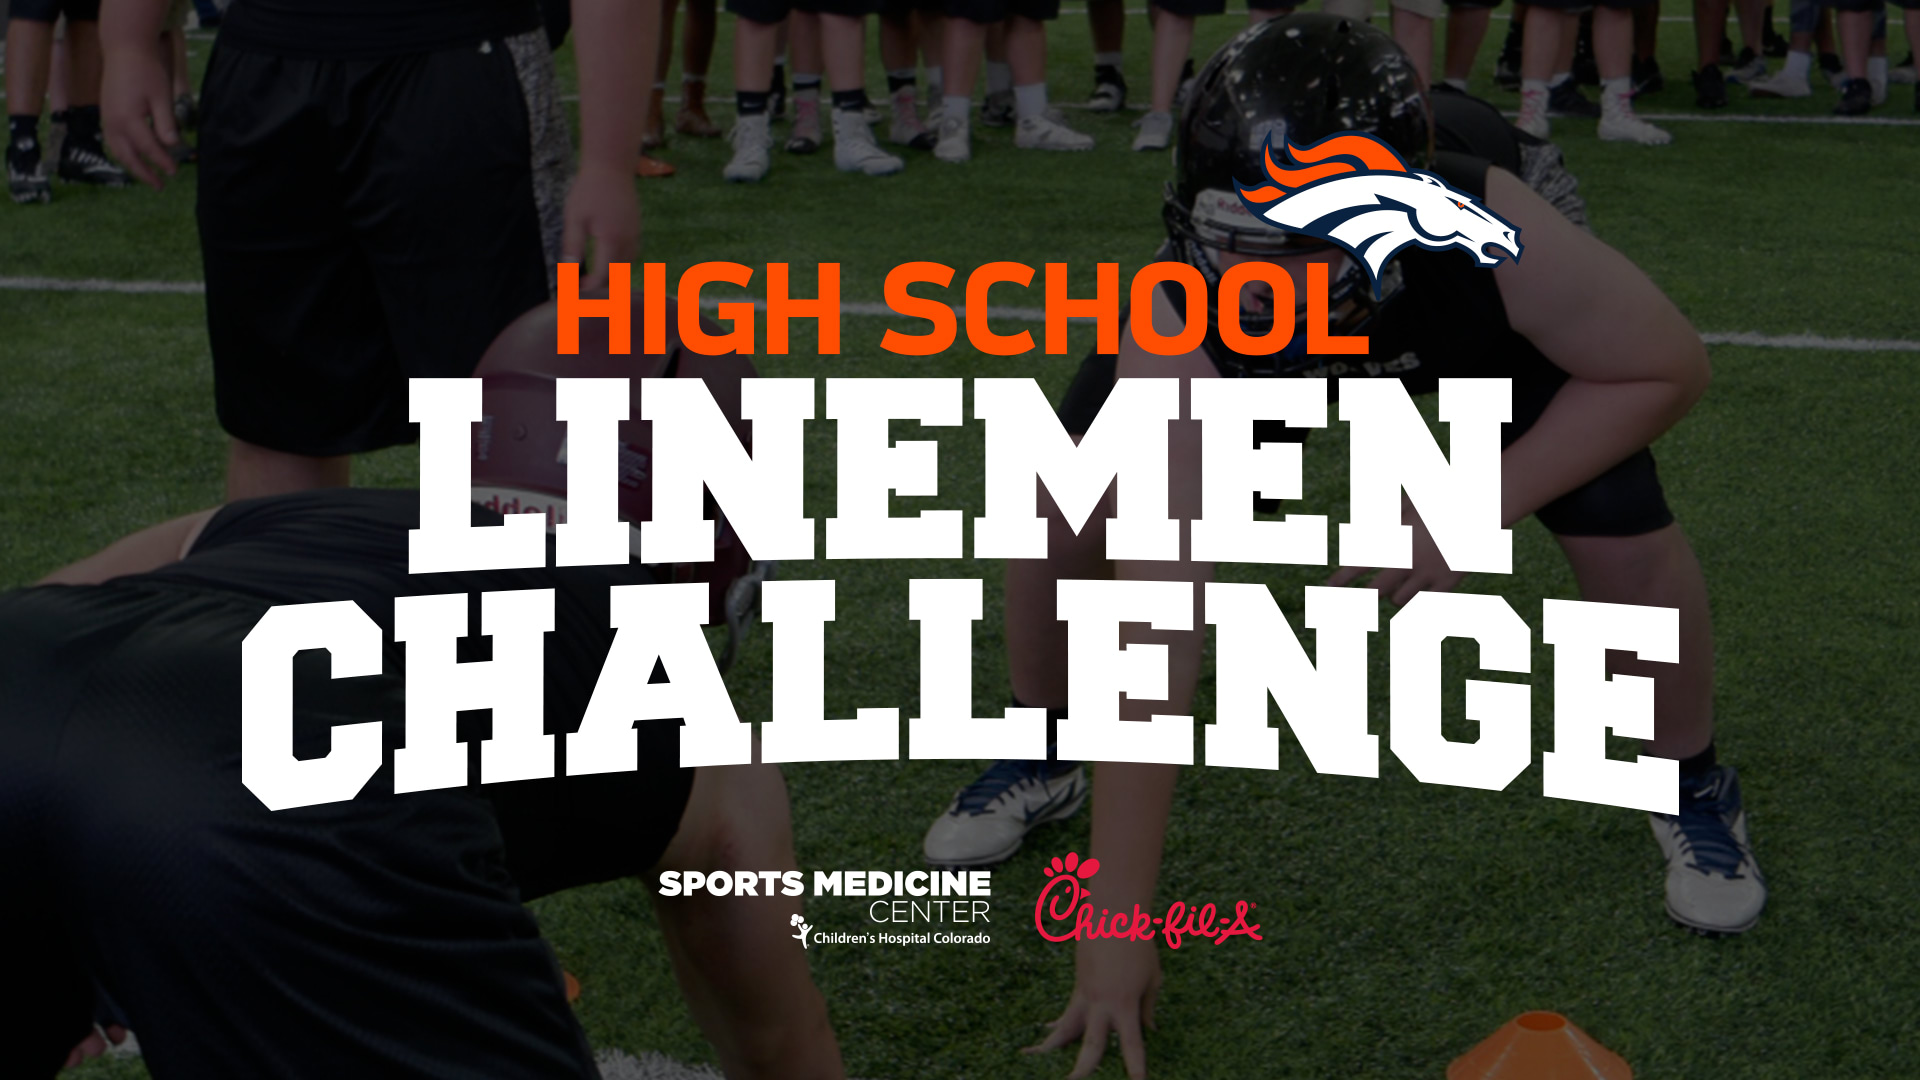 Linemen Challenge